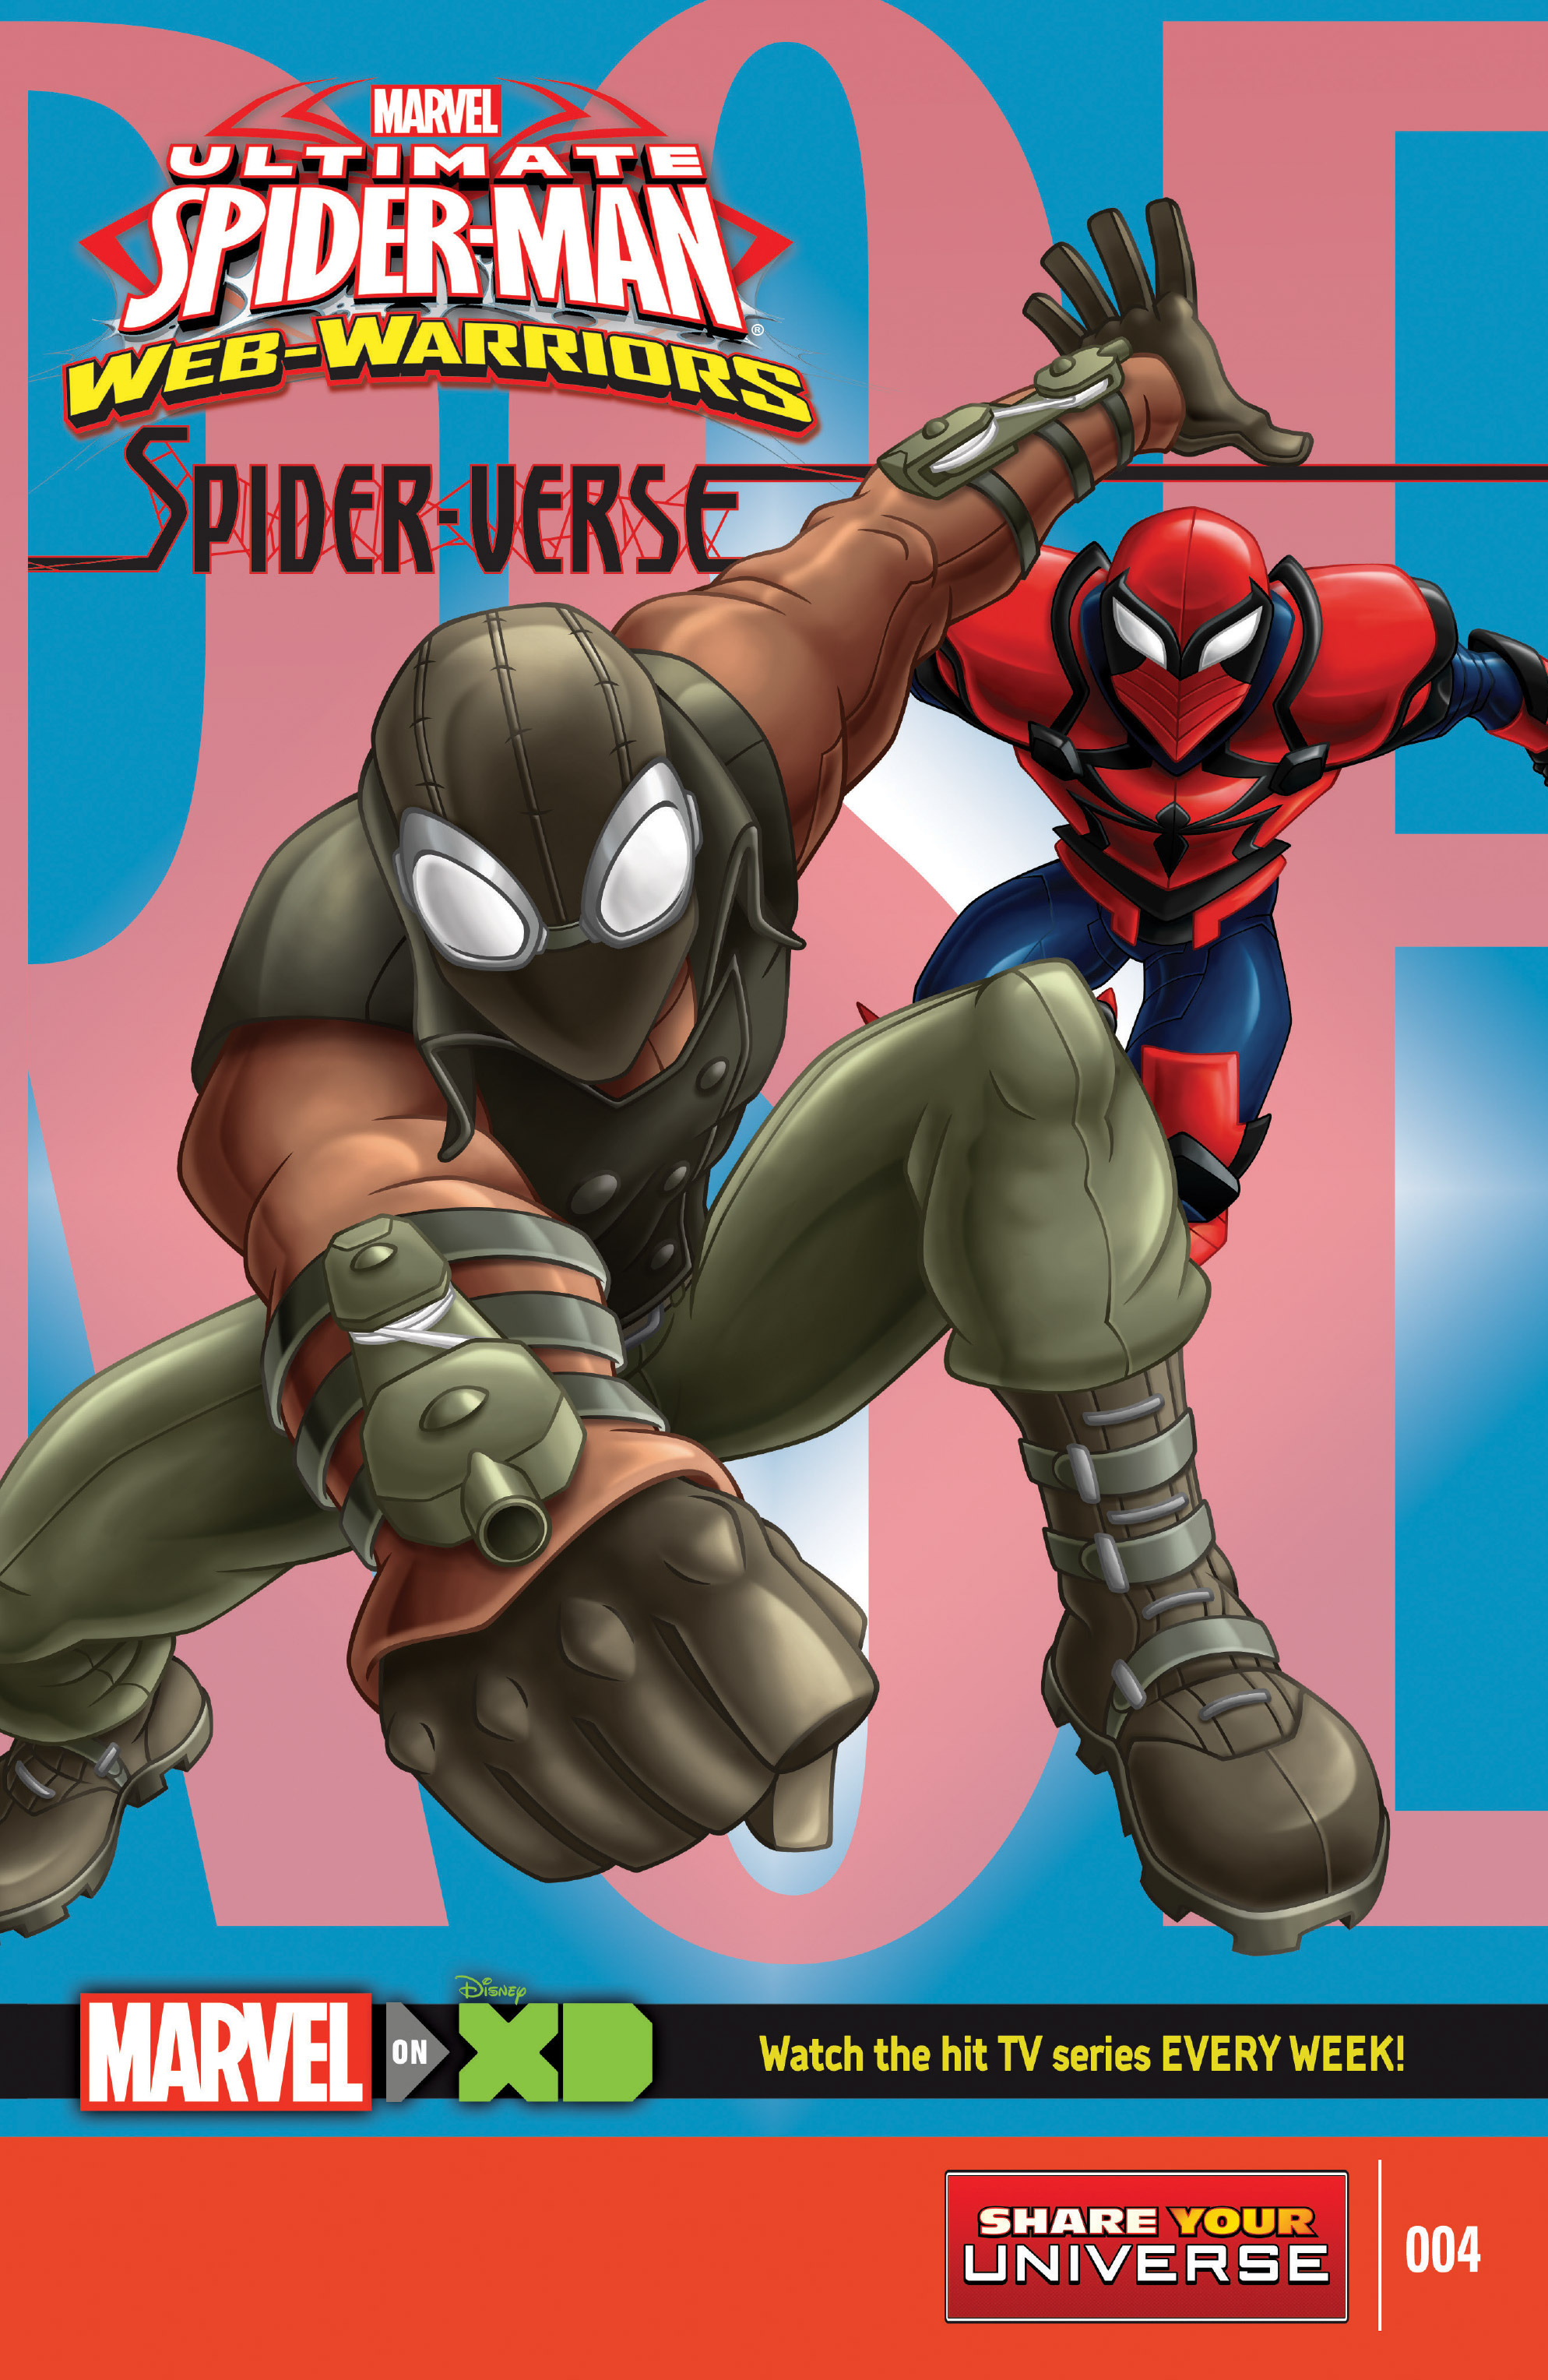 marvel universe ultimate spiderman webwarriors